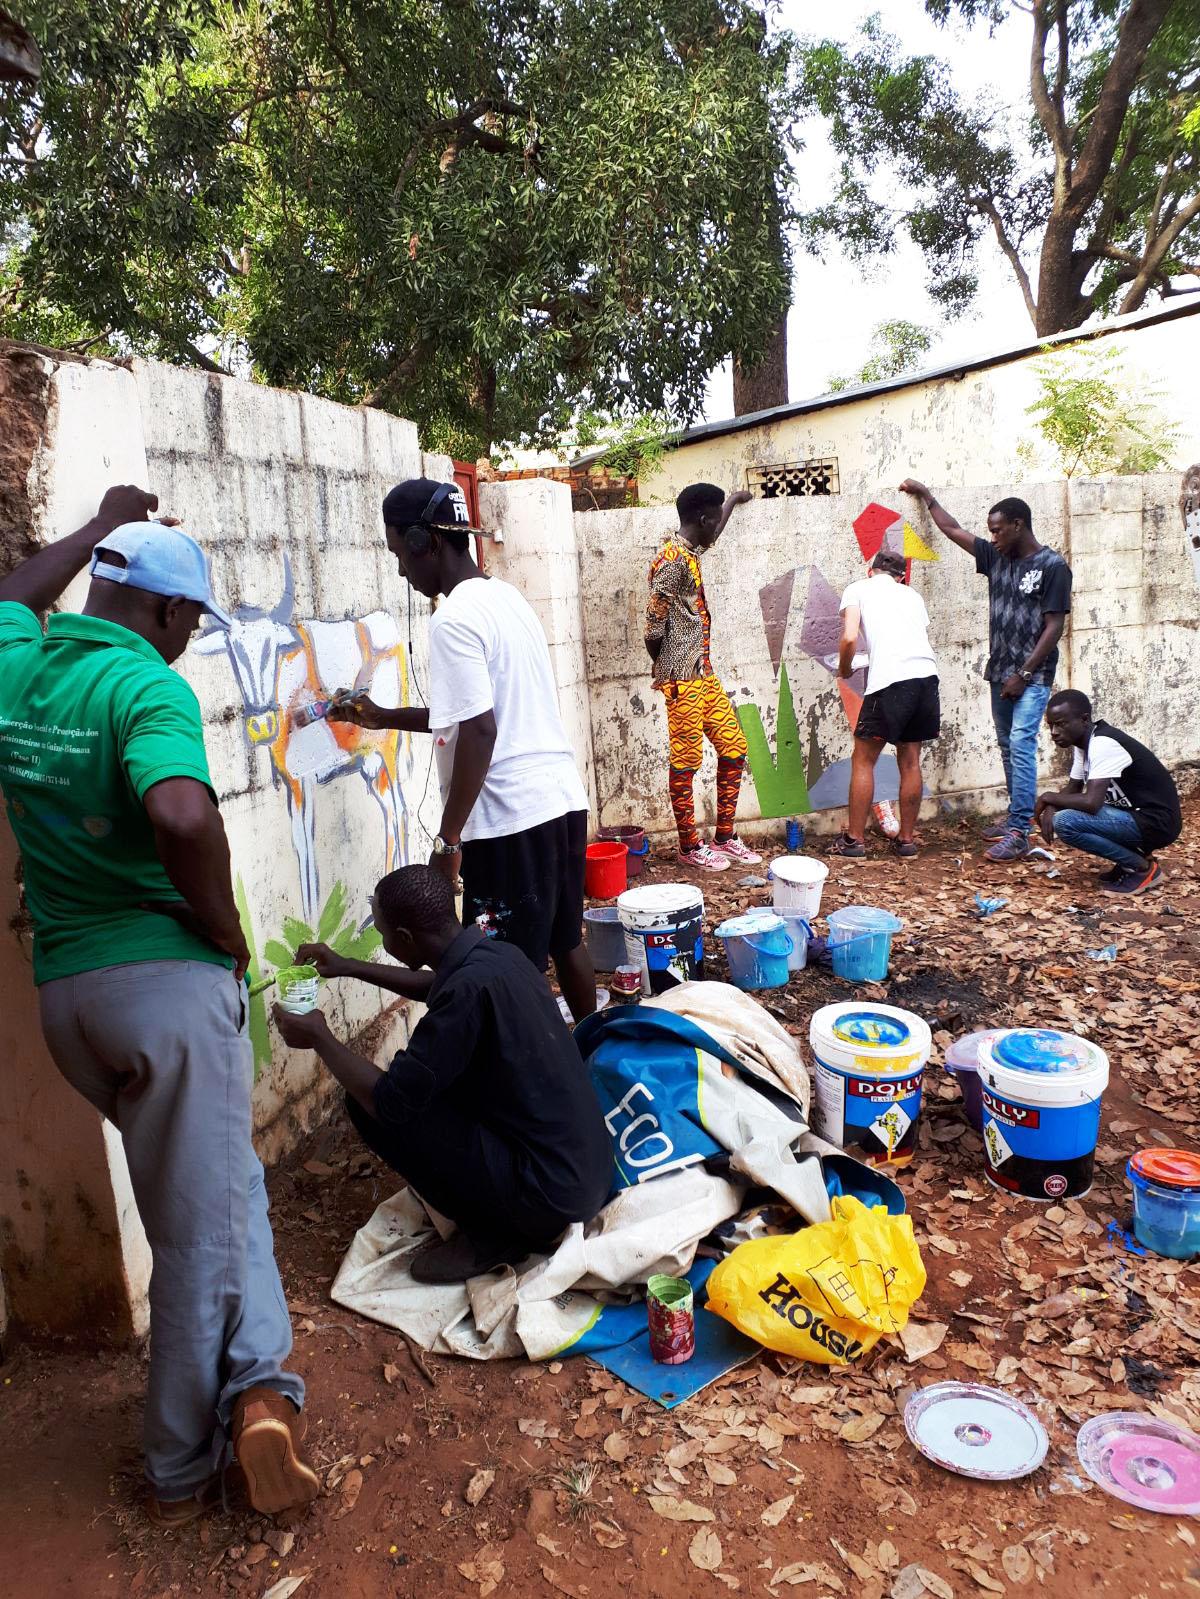 street art pittura Mani Tese Guinea Bissau 2017